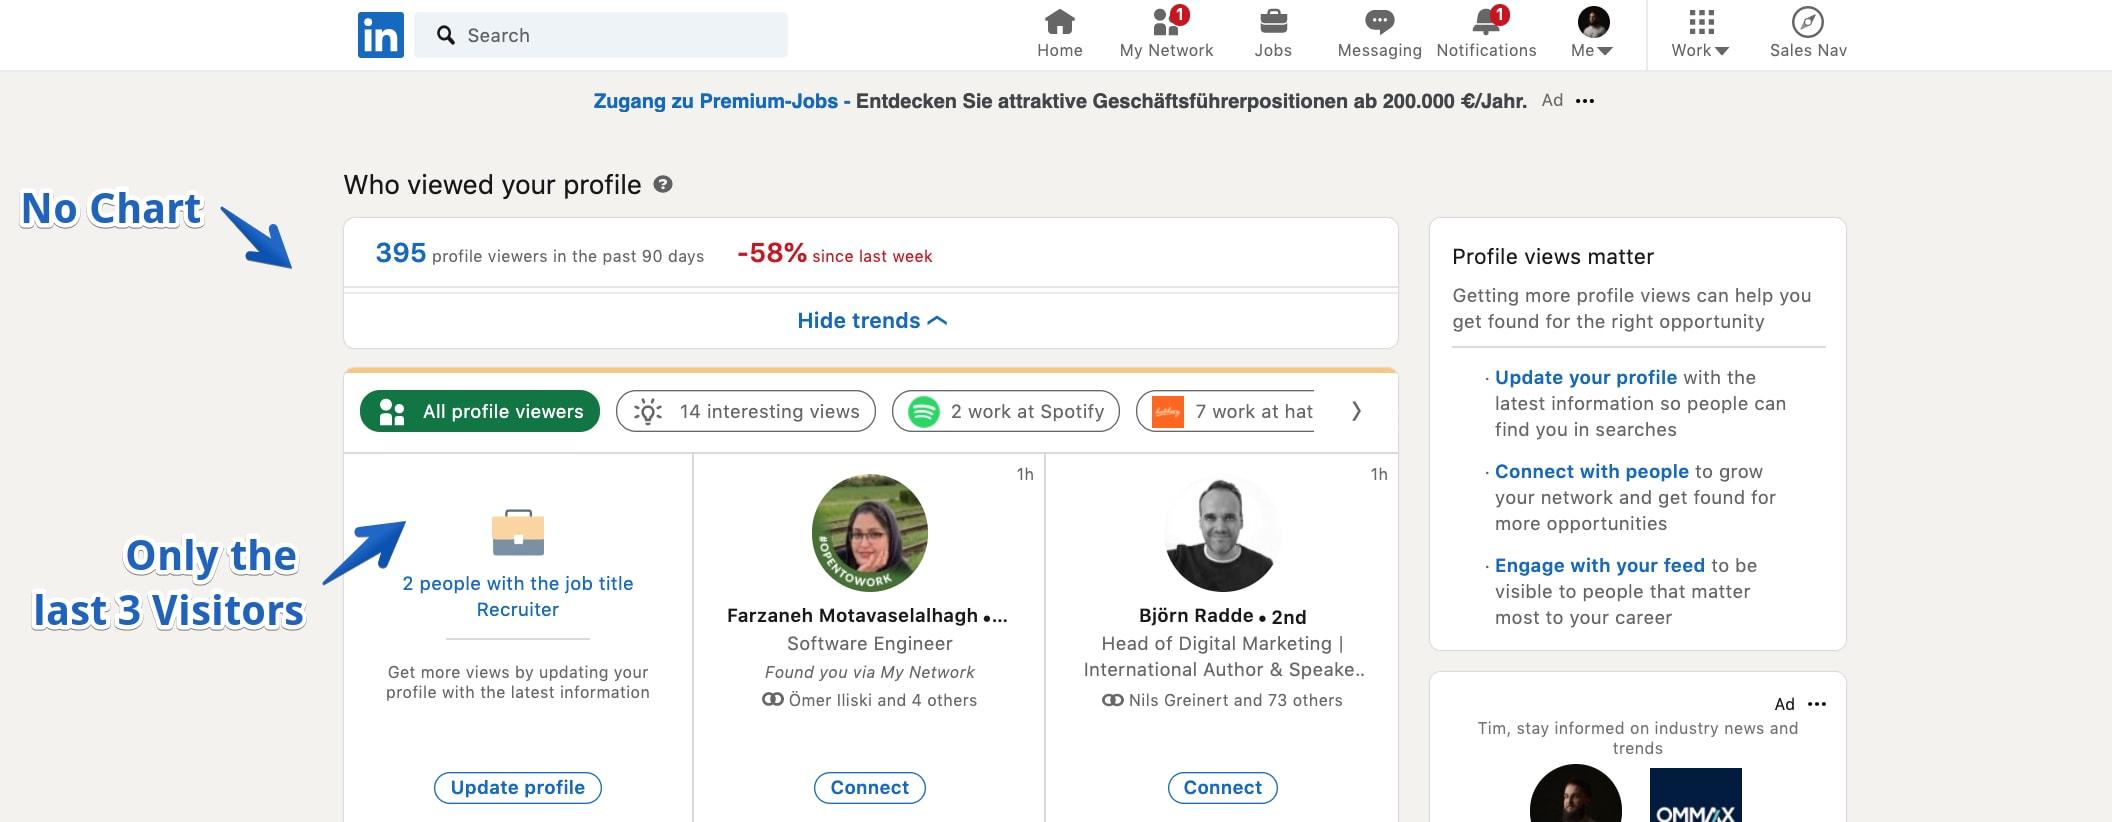 LinkedIn Analytics Profile View Free Plan